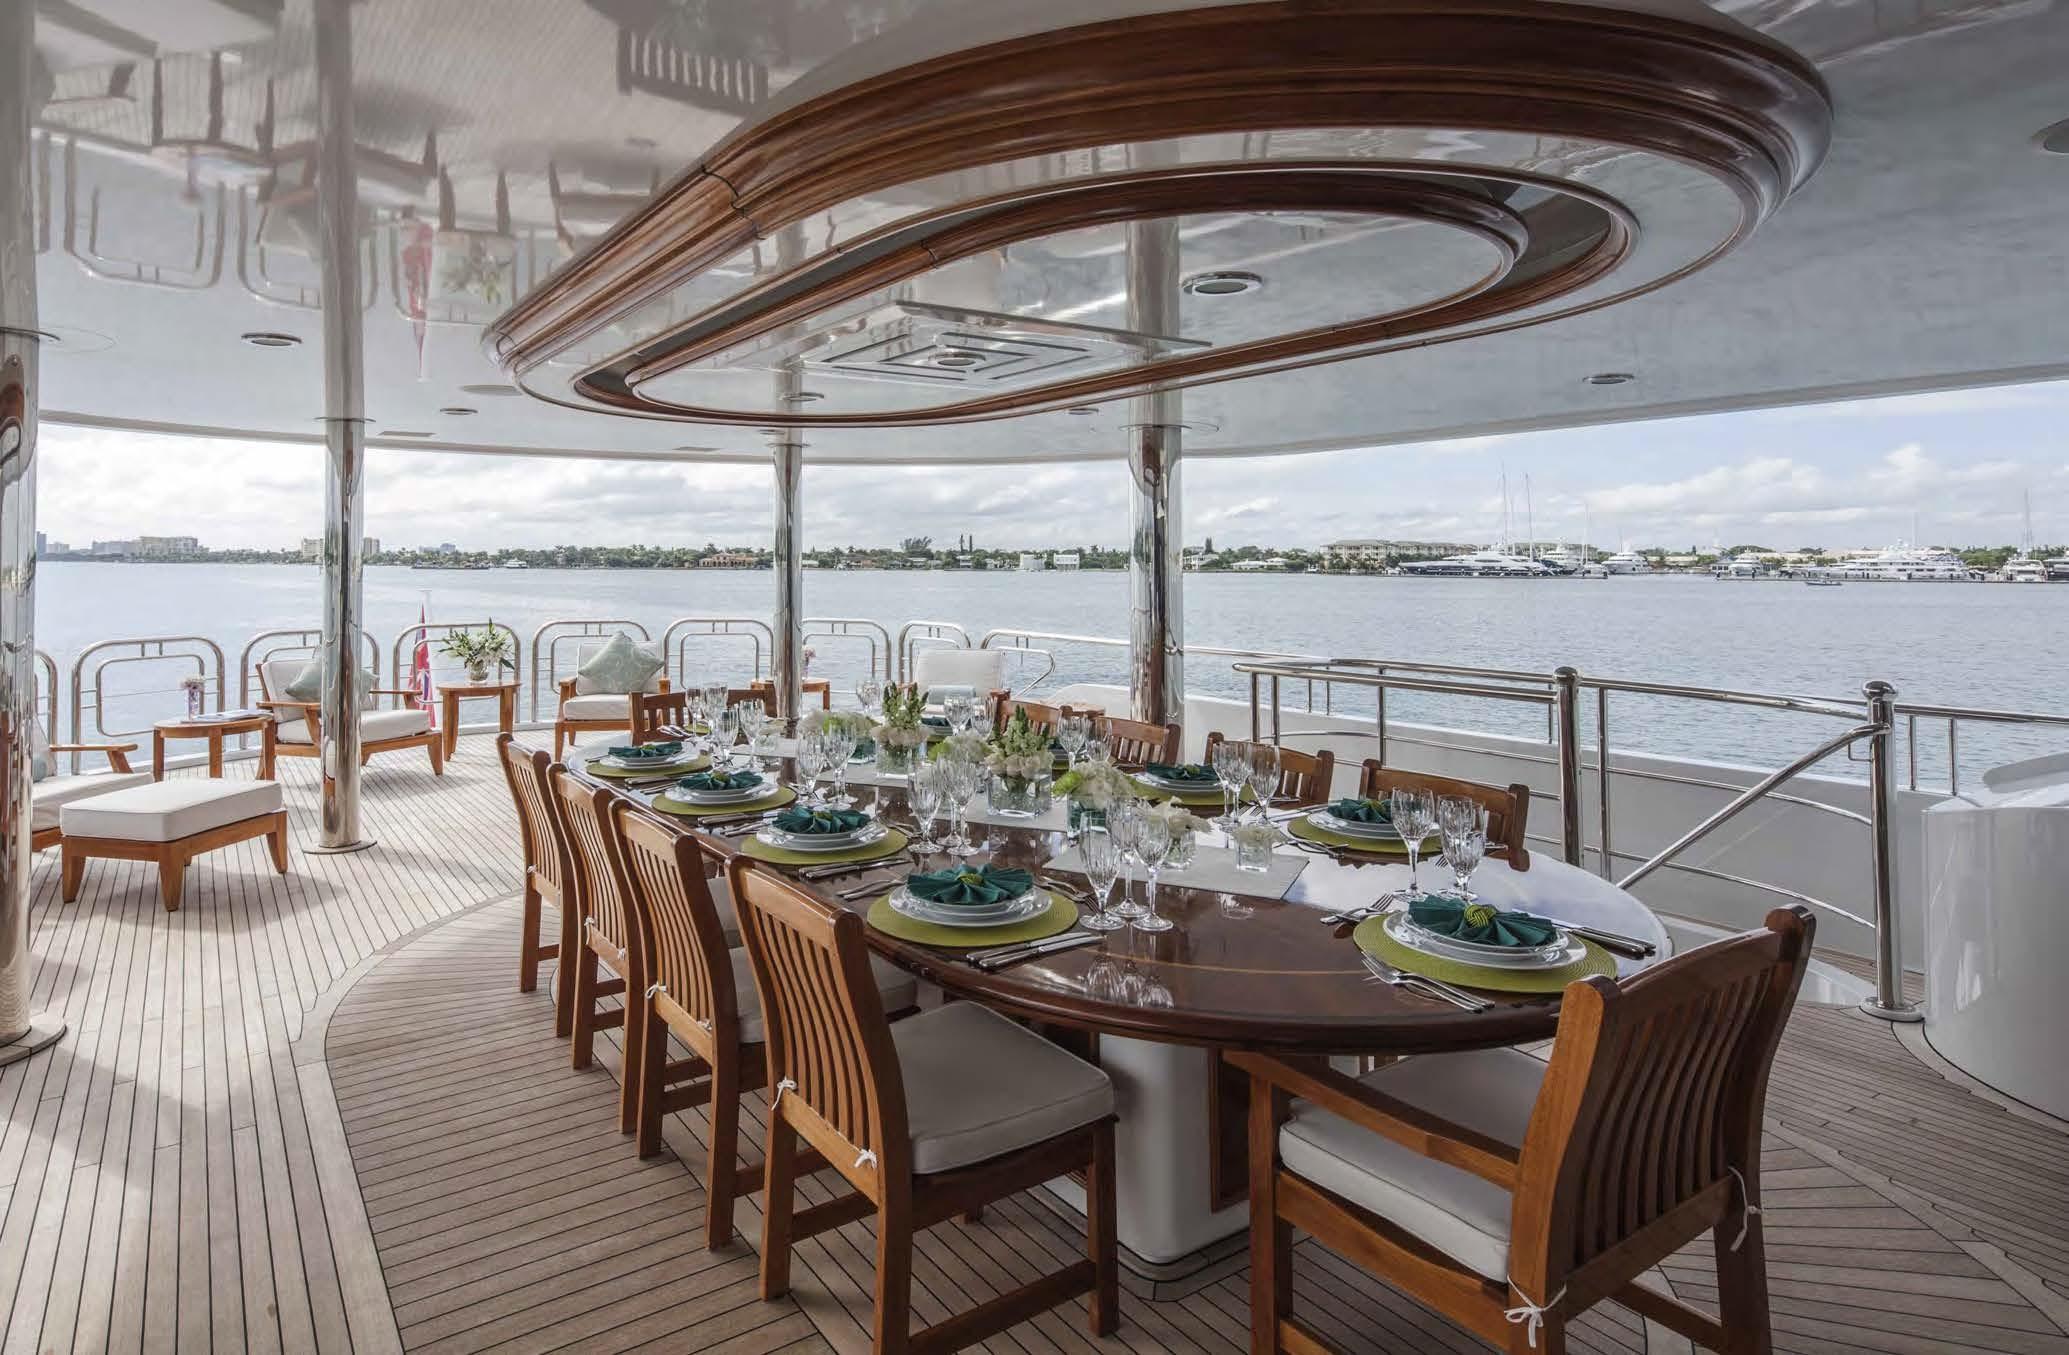 Alfresco Dining Exterior Deck